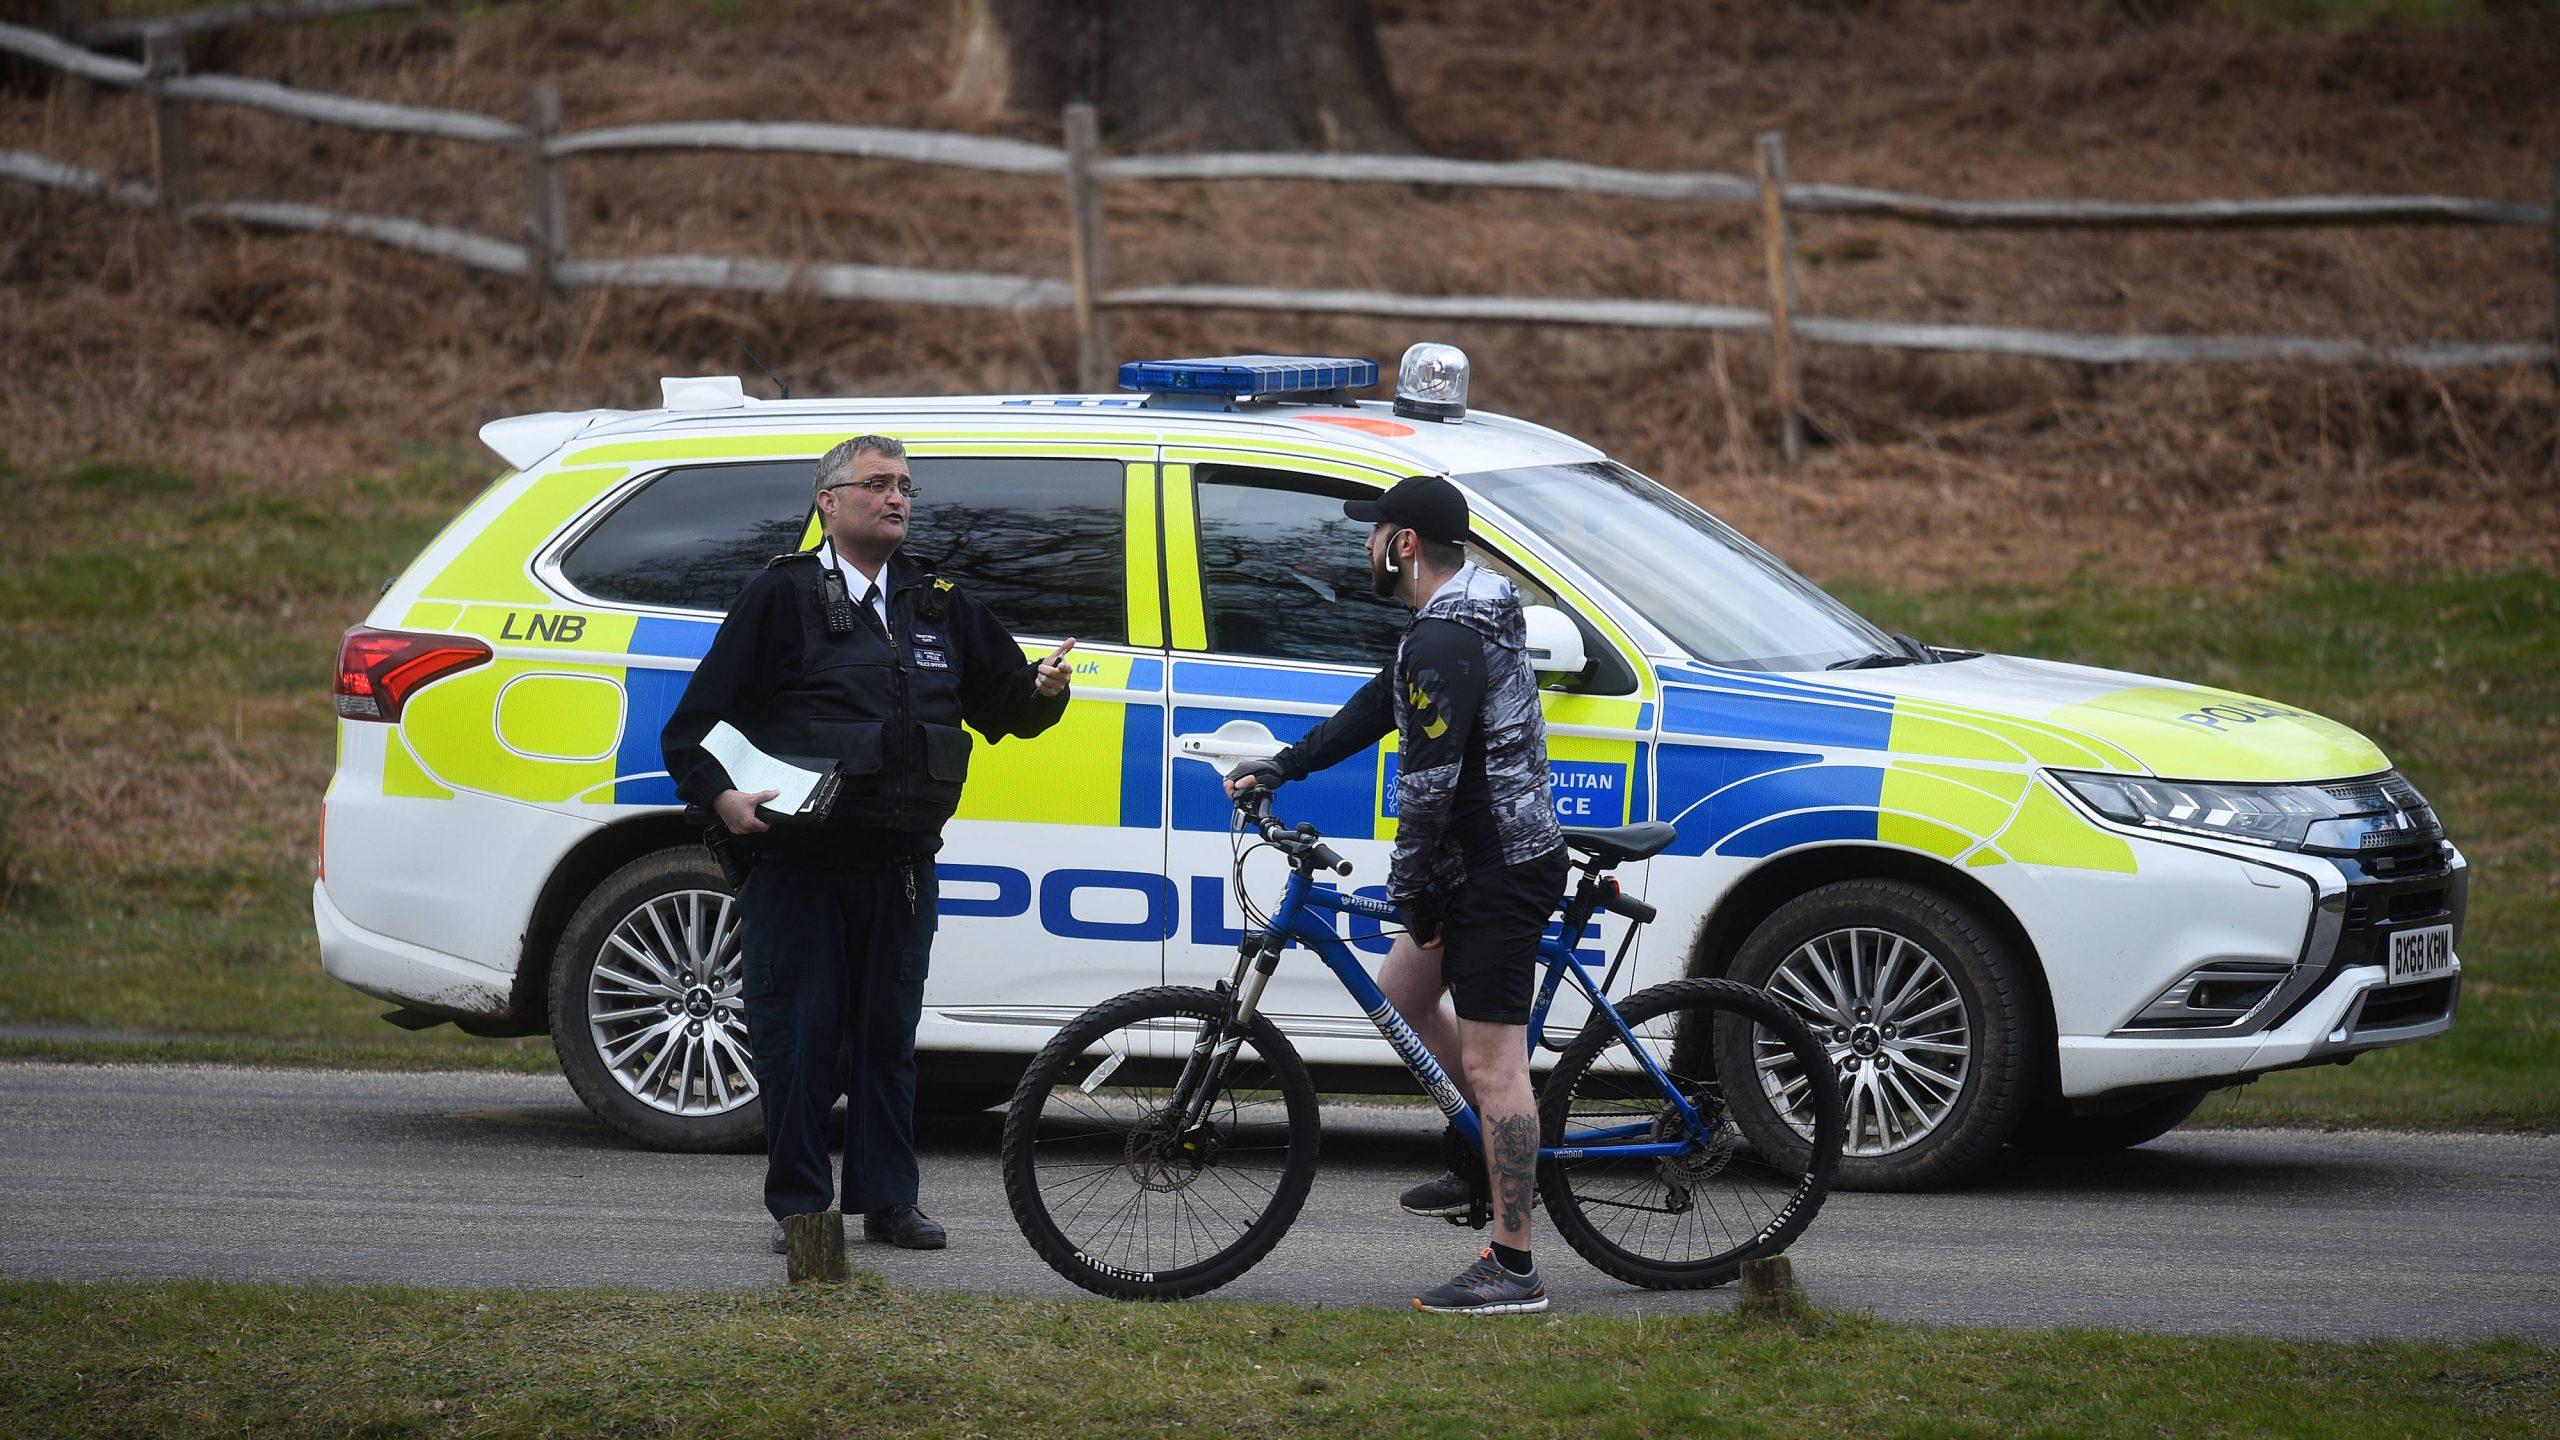 https://lisaslaw.co.uk/wp-content/uploads/2020/04/police1-scaled.jpg